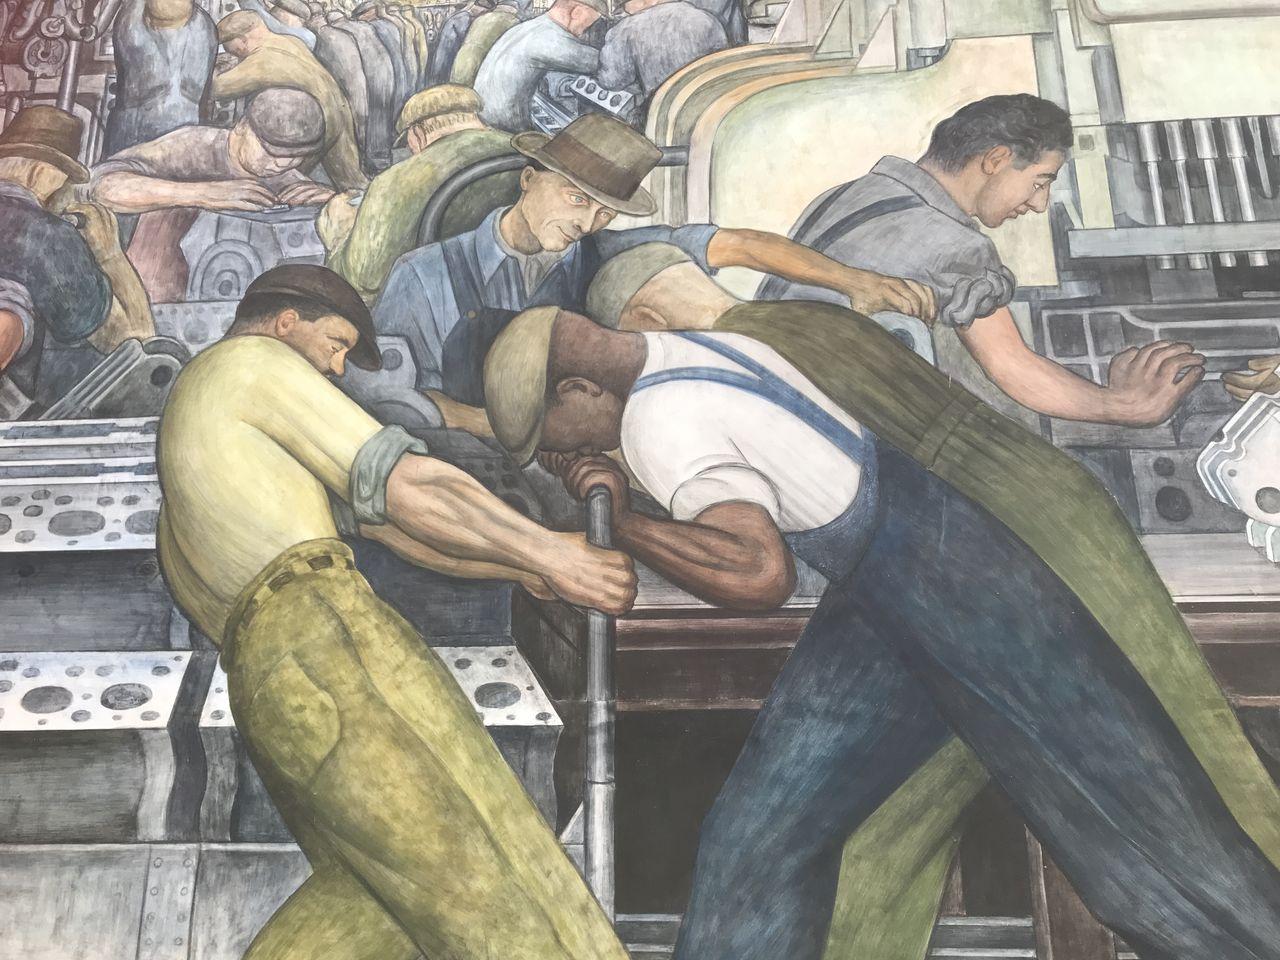 Diego mural